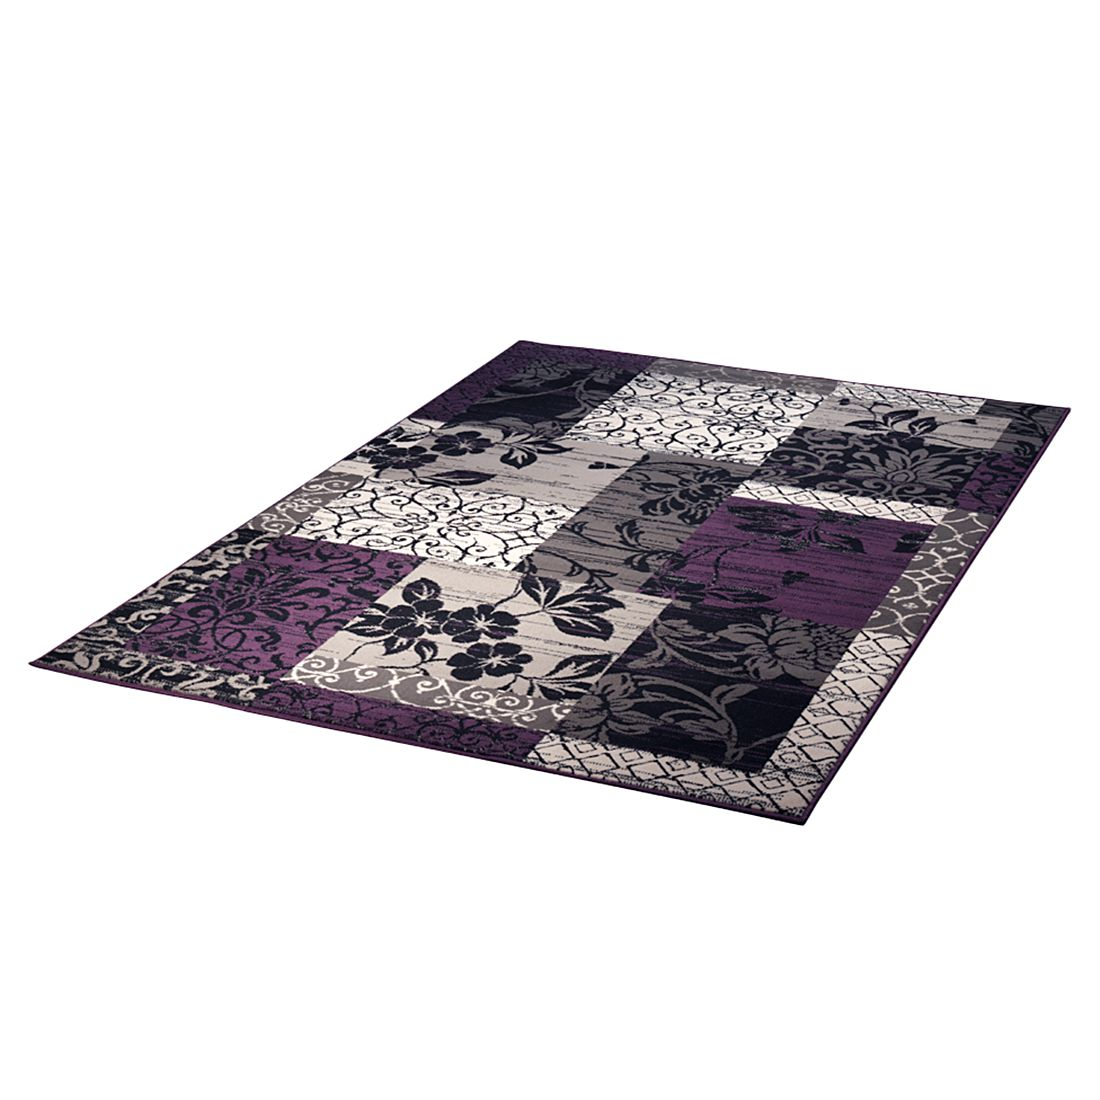 Teppich Prime Pile Line - Schwarz/Violett - 60 x 110 cm, Hanse Home Collection